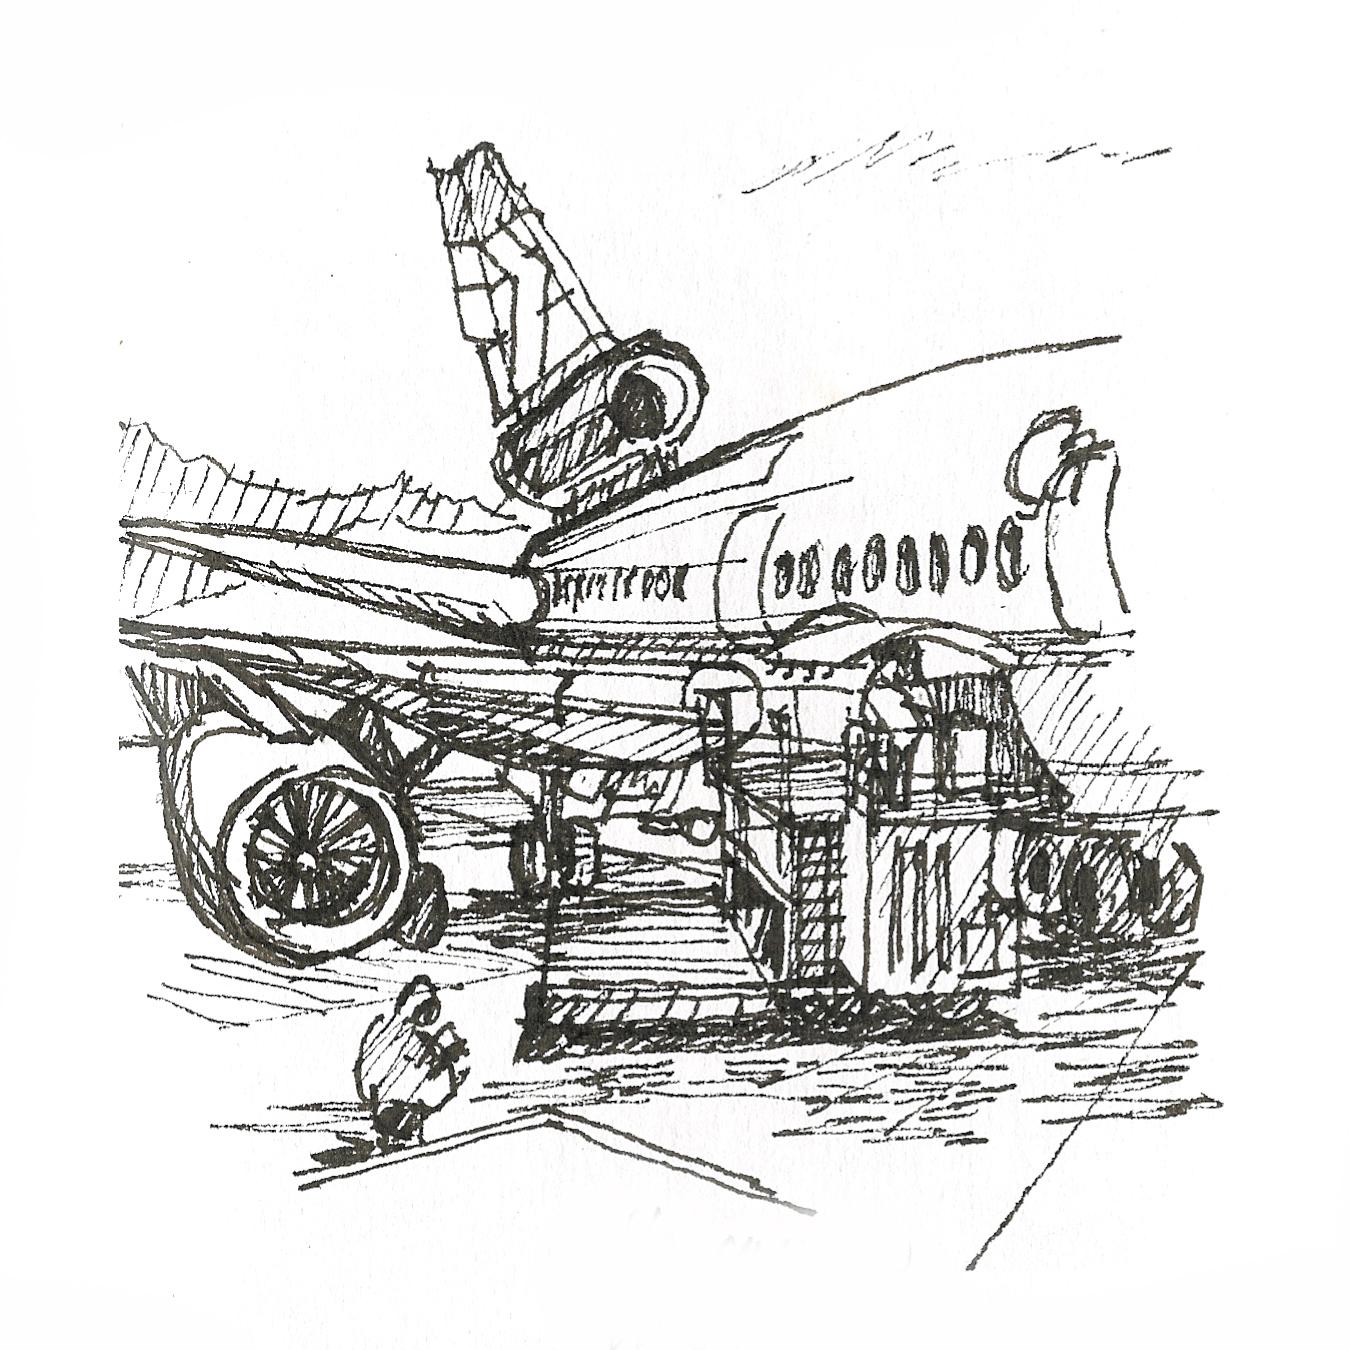 1350x1350 Free Hand Sketching Sketchingjourney's Blog